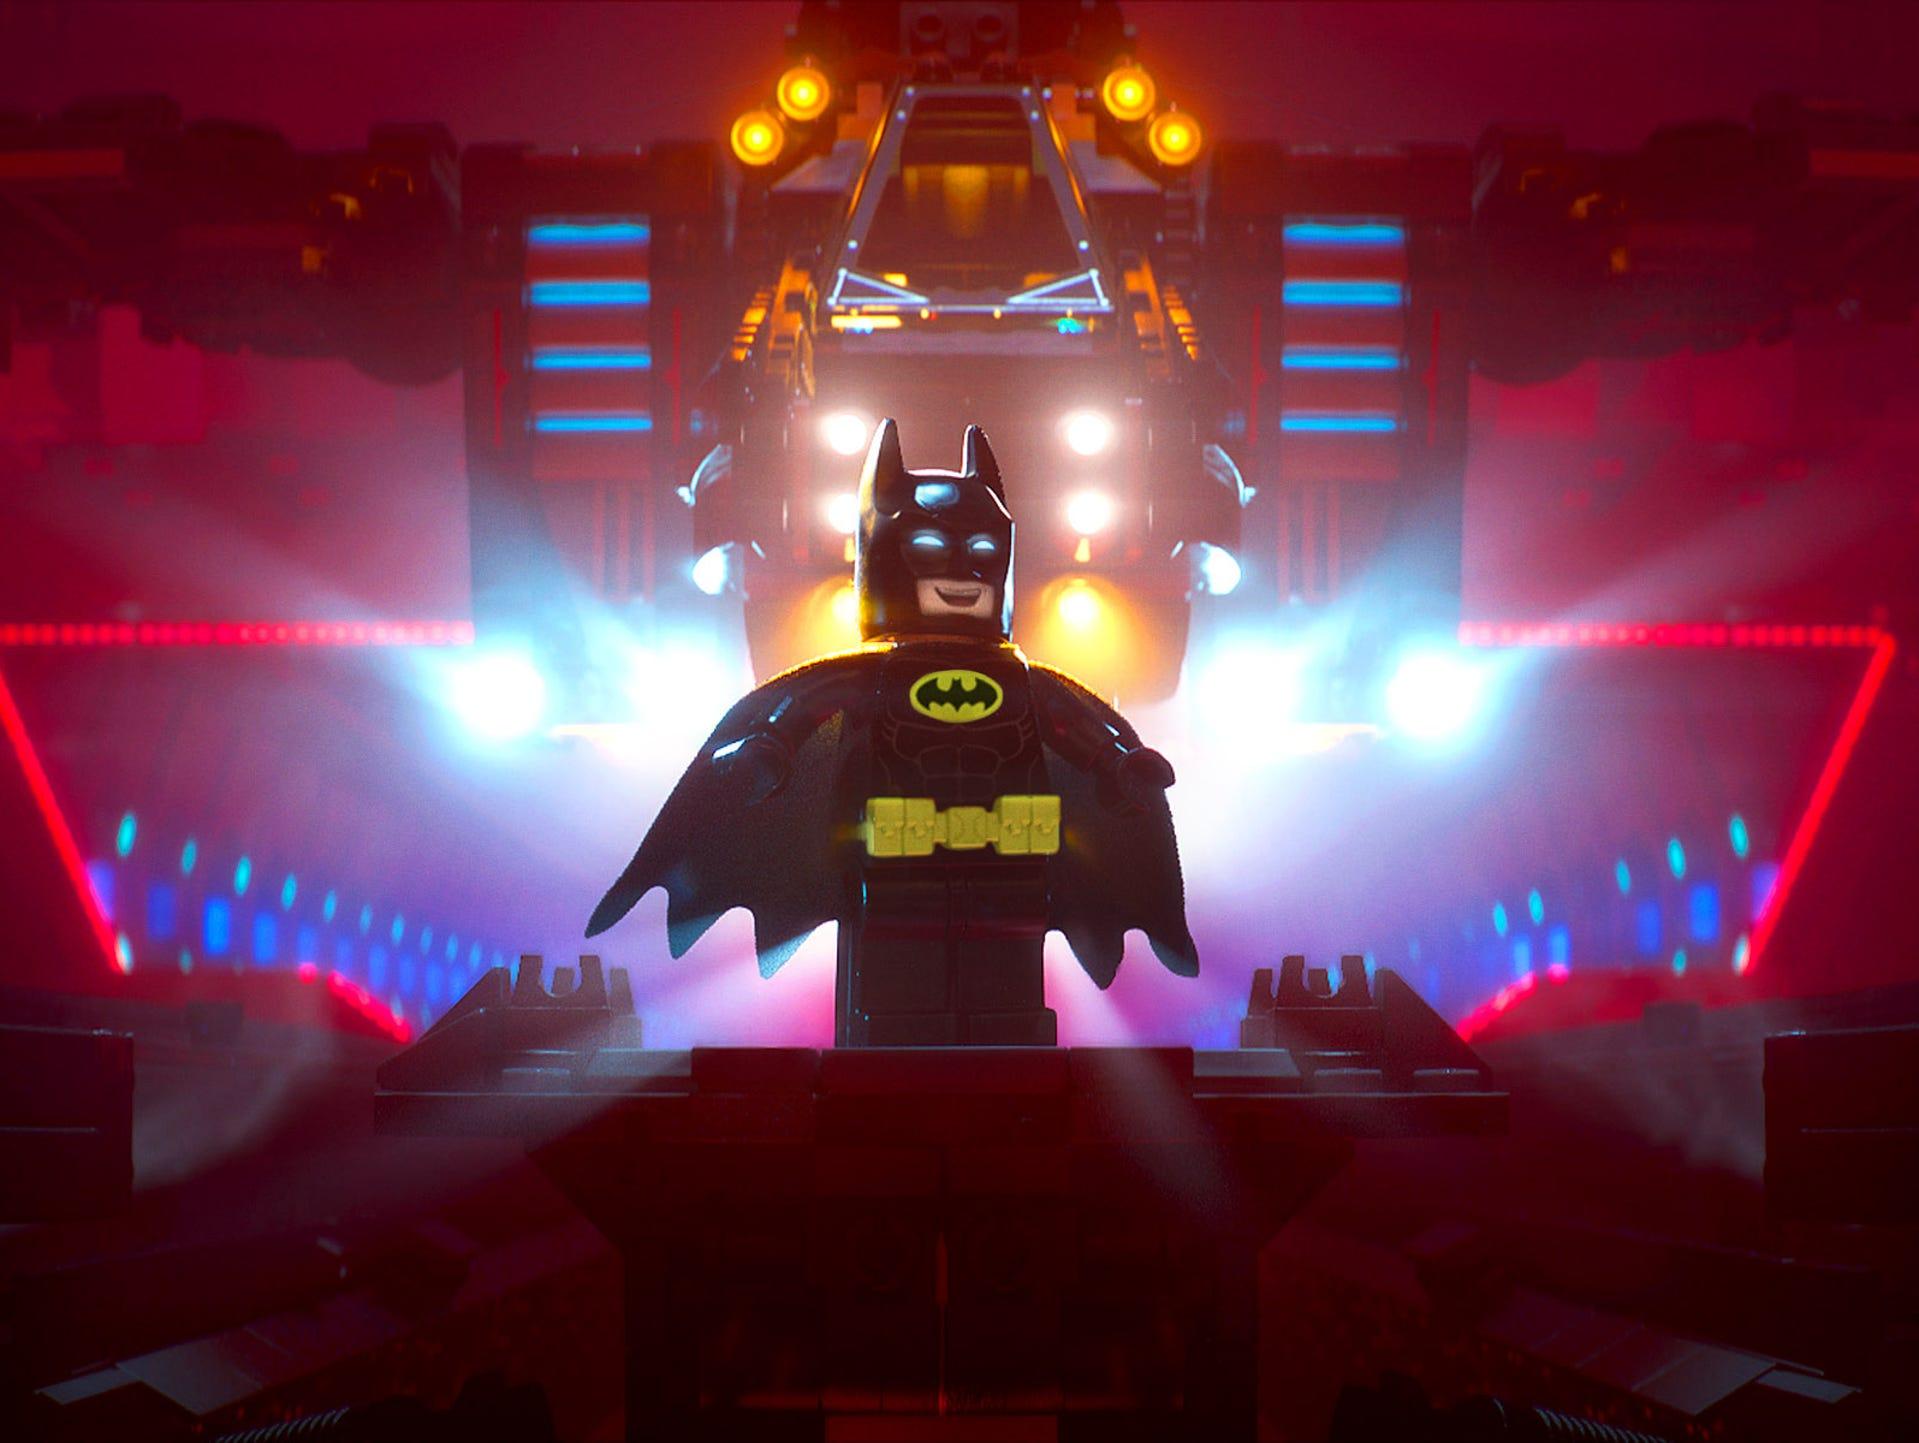 First Look: The LEGO Batman Movie